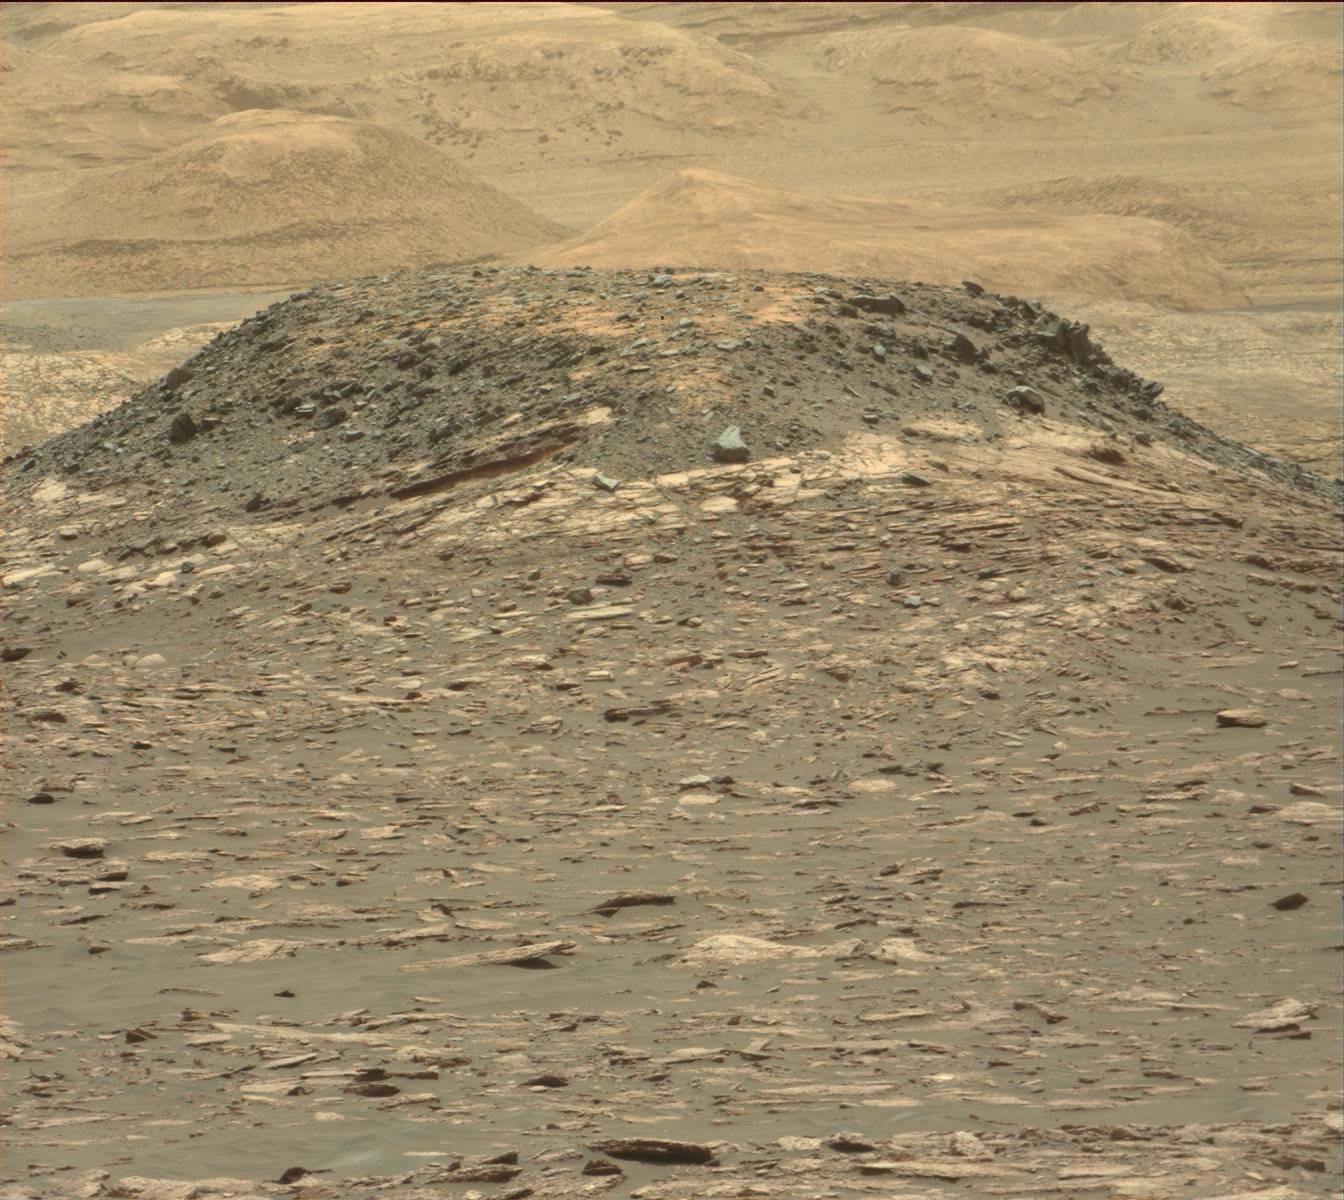 Sol 1539 Mastcam Ireson Hill